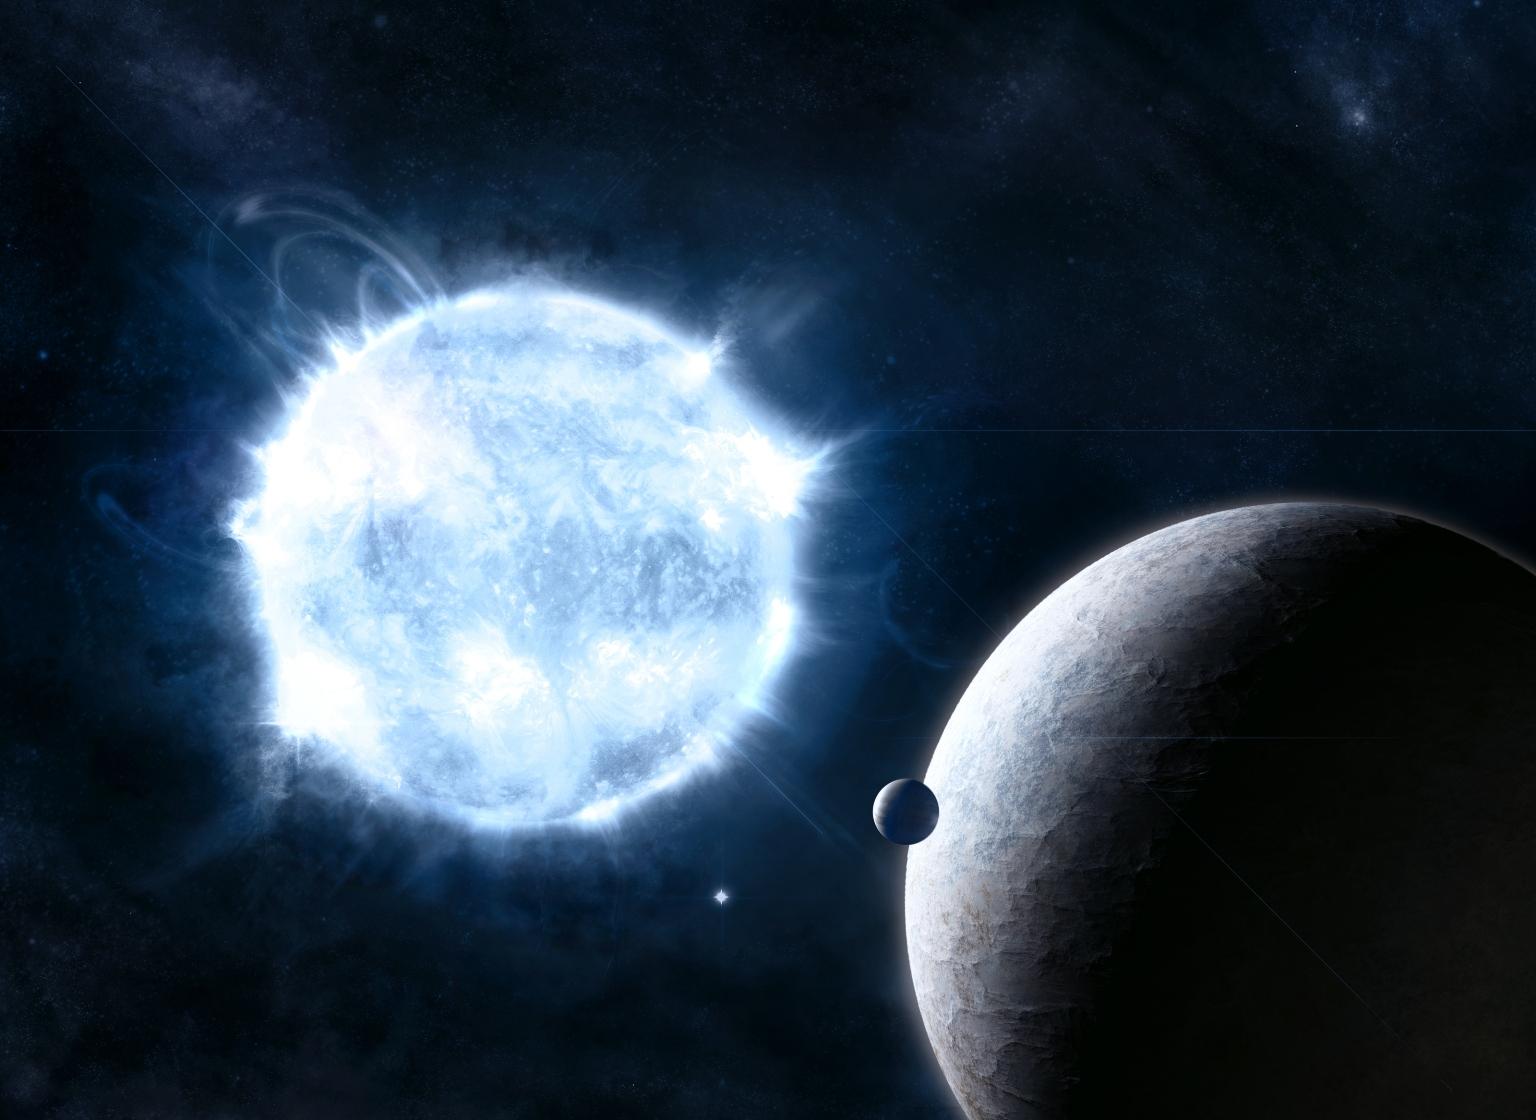 giant star blue white - photo #16